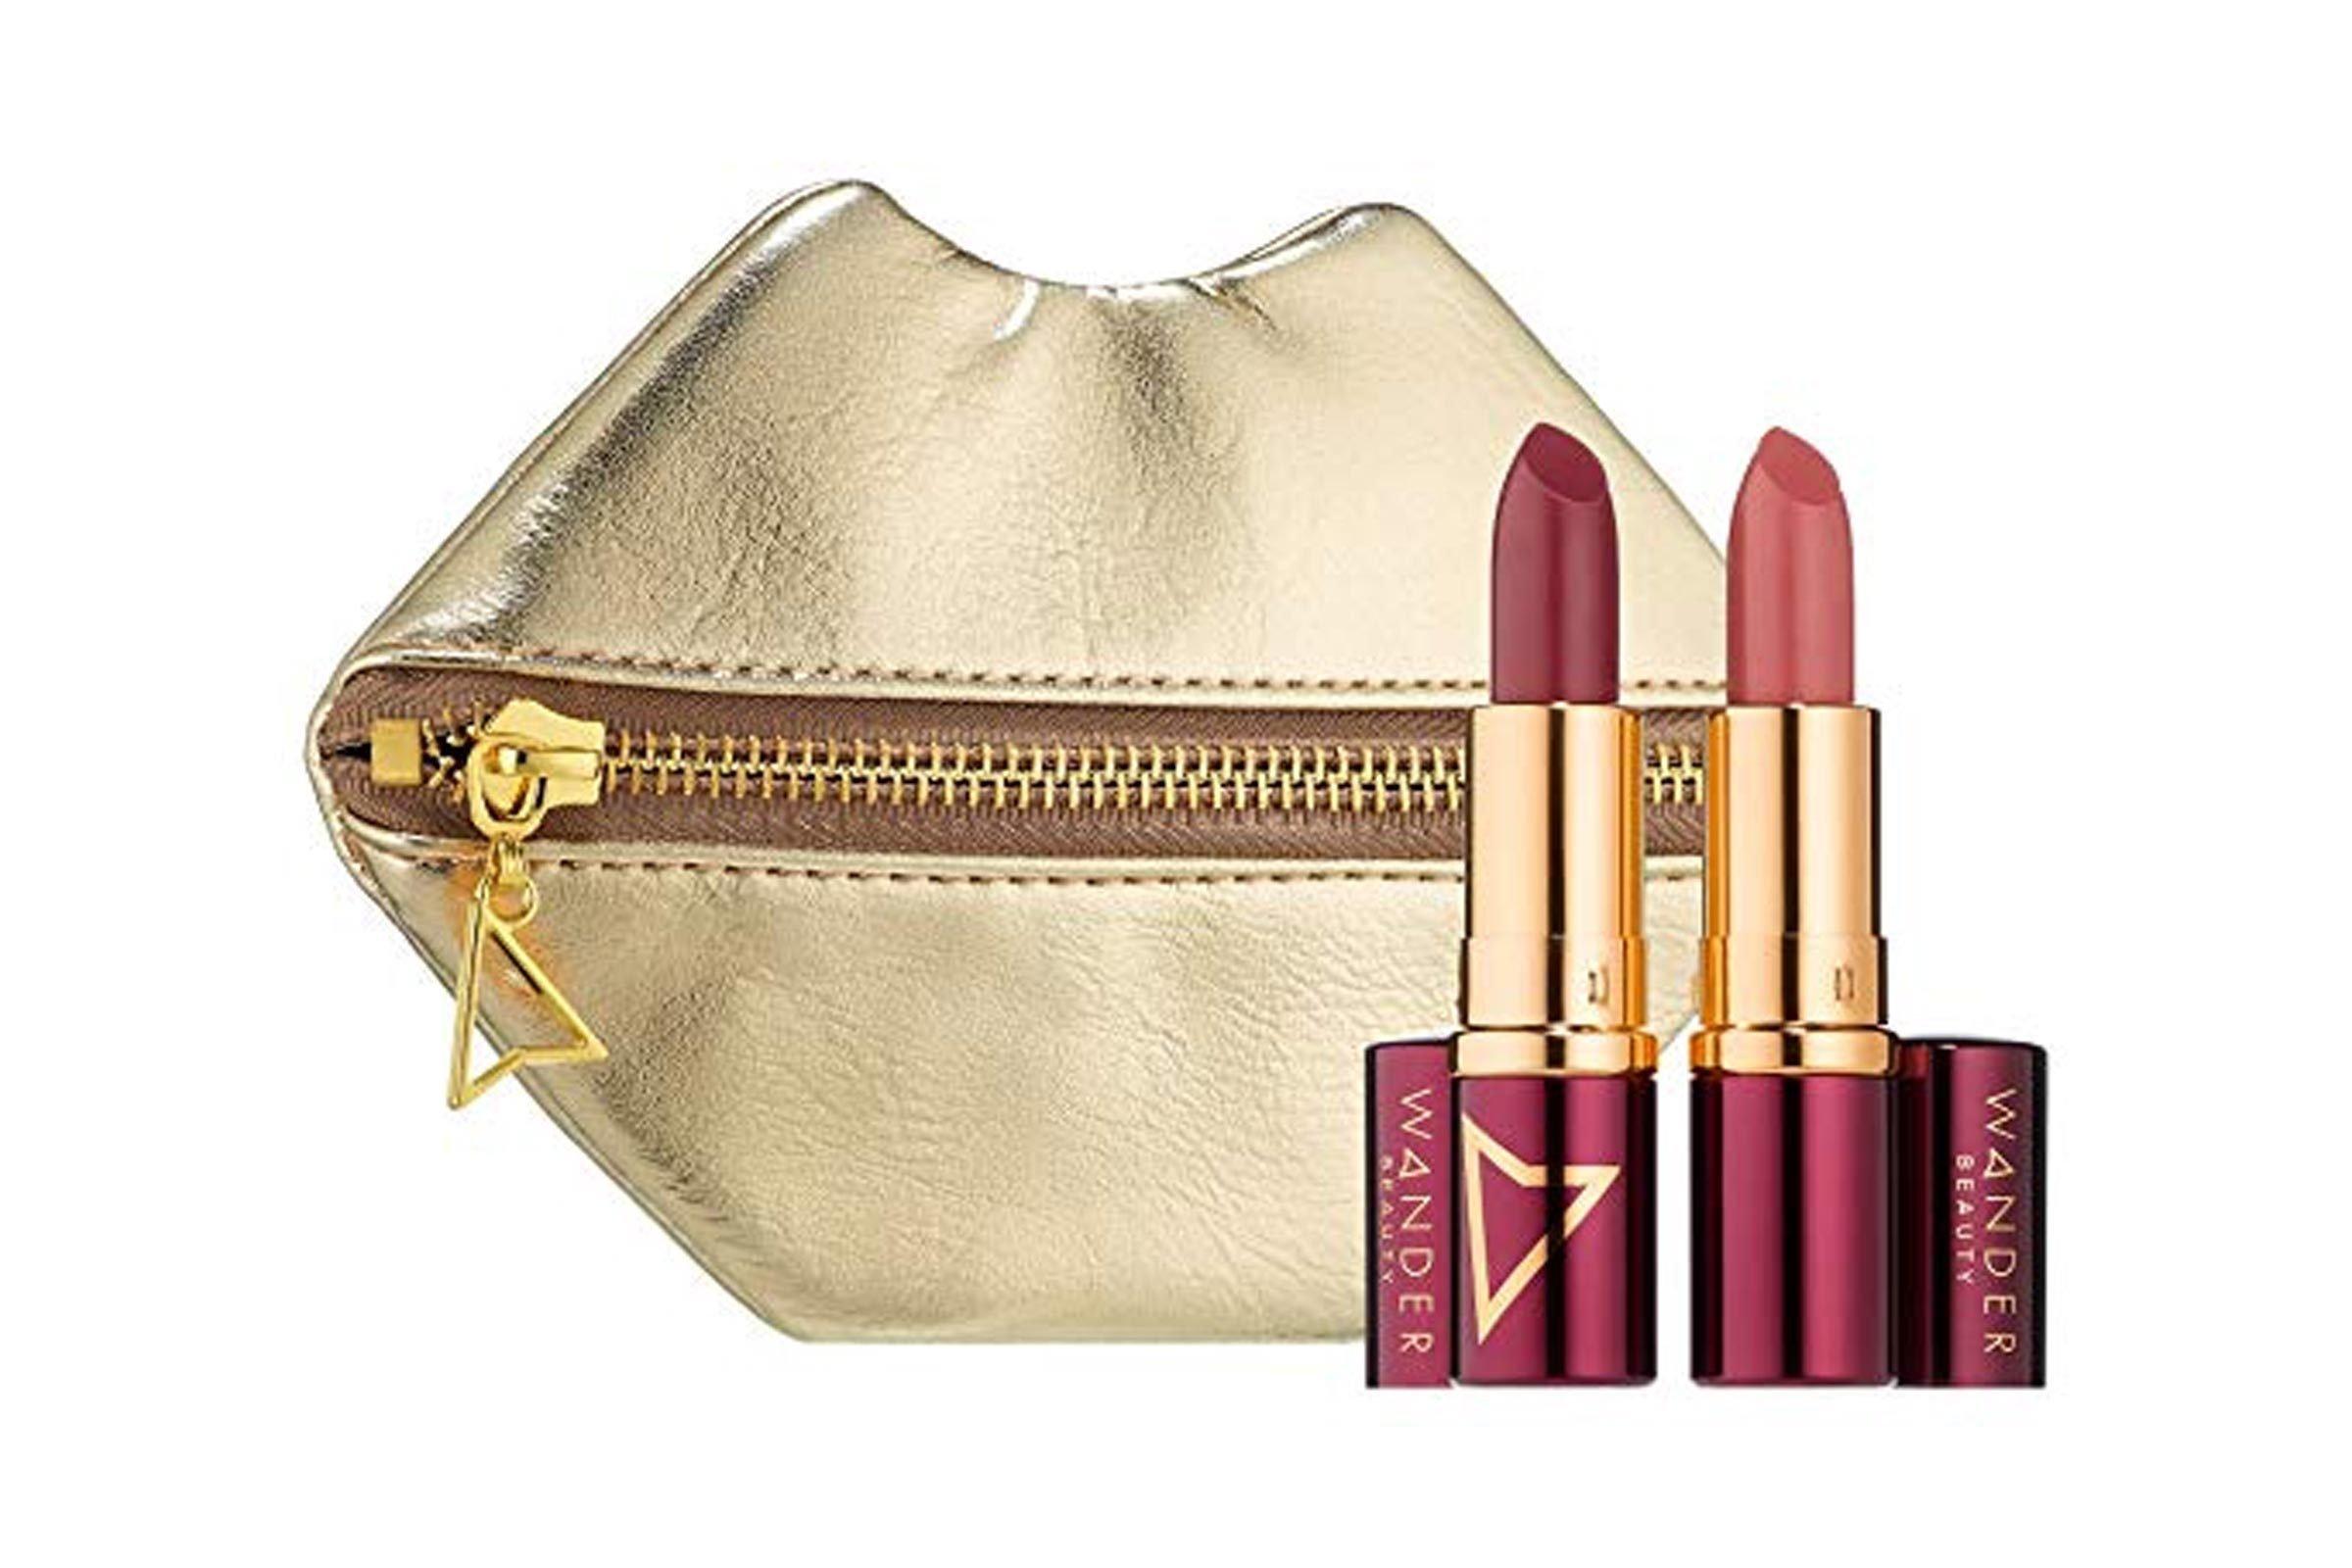 WANDER BEAUTY Kiss & Tell: Wanderout Lipstick in Girl Boss, Miss Behave